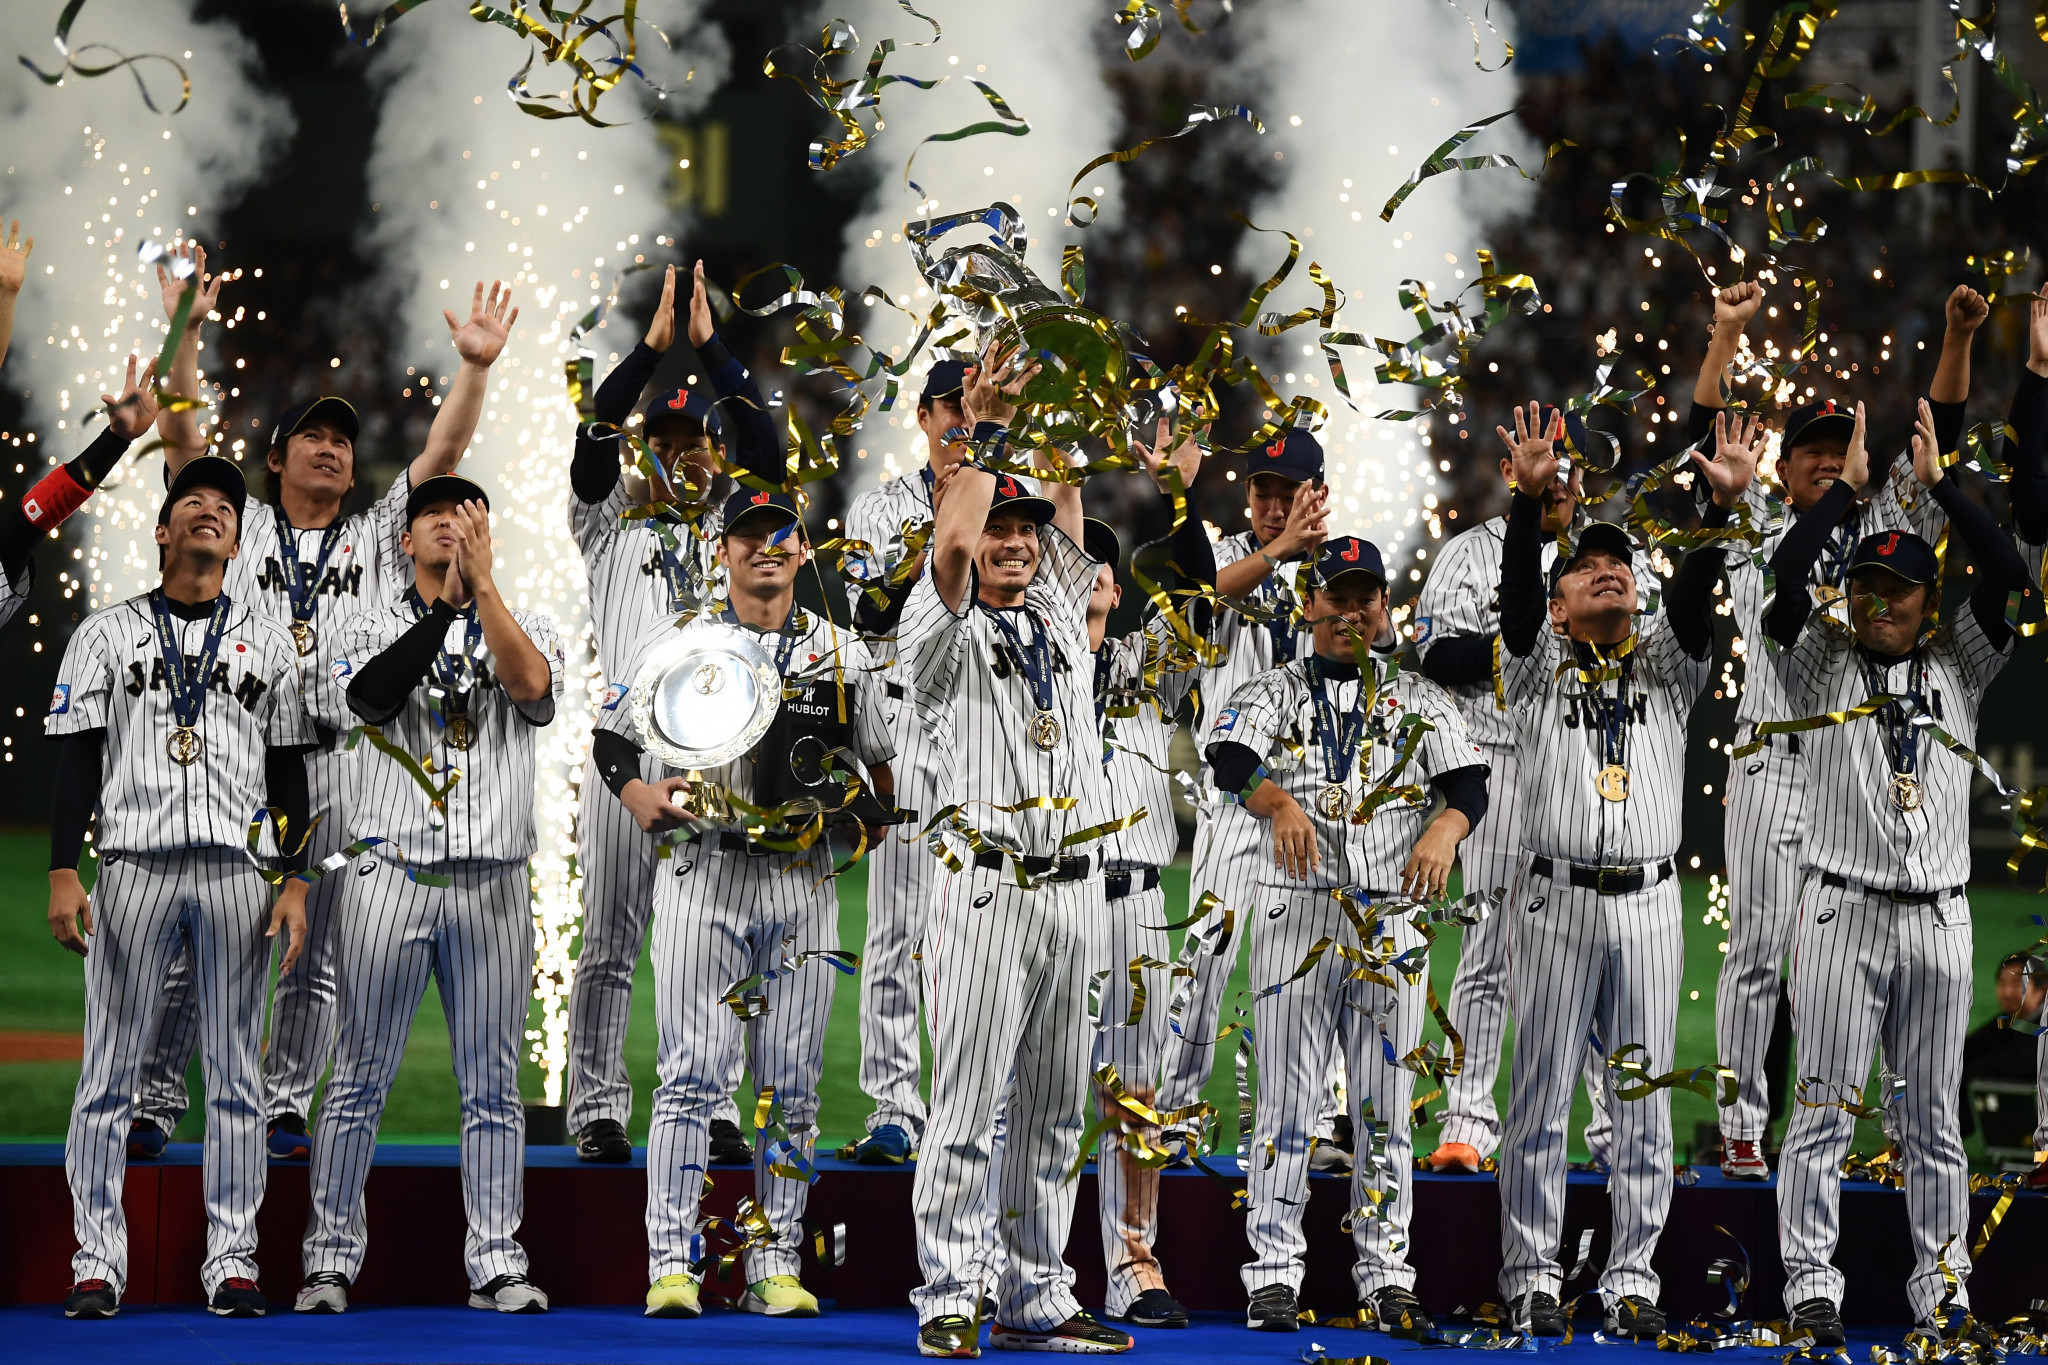 Japan won the 2019 WBSC Premier12 title ©Getty Images